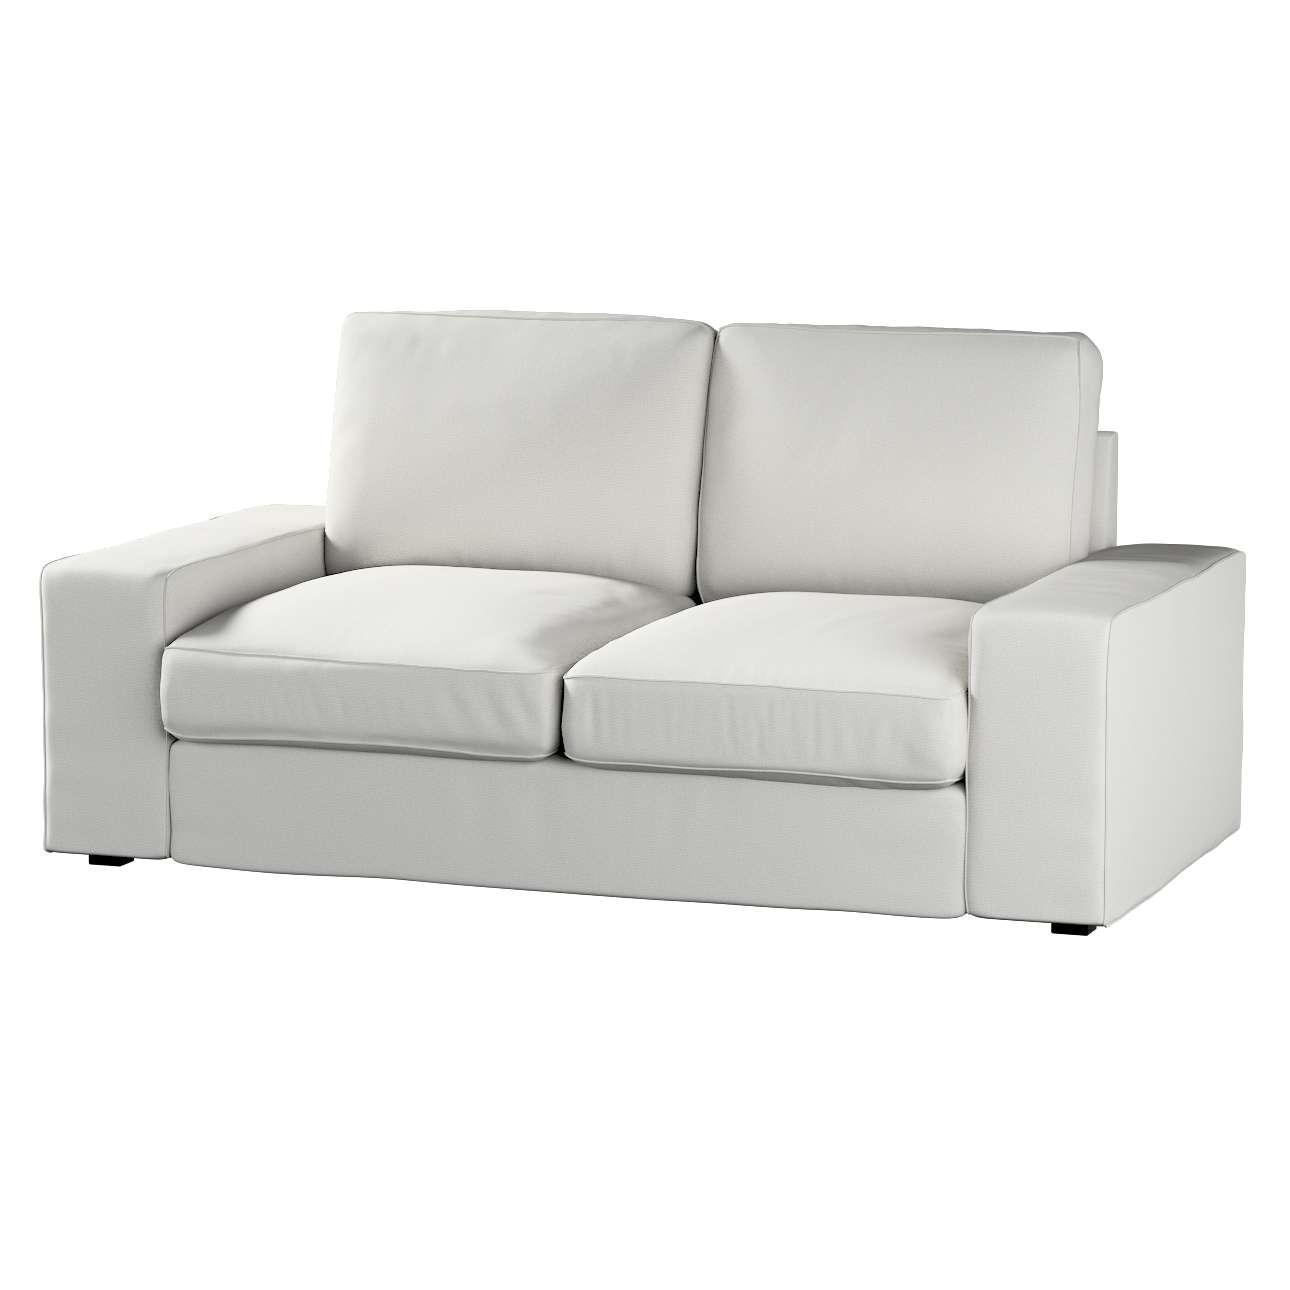 Kivik 2-Sitzer Sofabezug Sofa Kivik 2-Sitzer von der Kollektion Etna, Stoff: 705-90